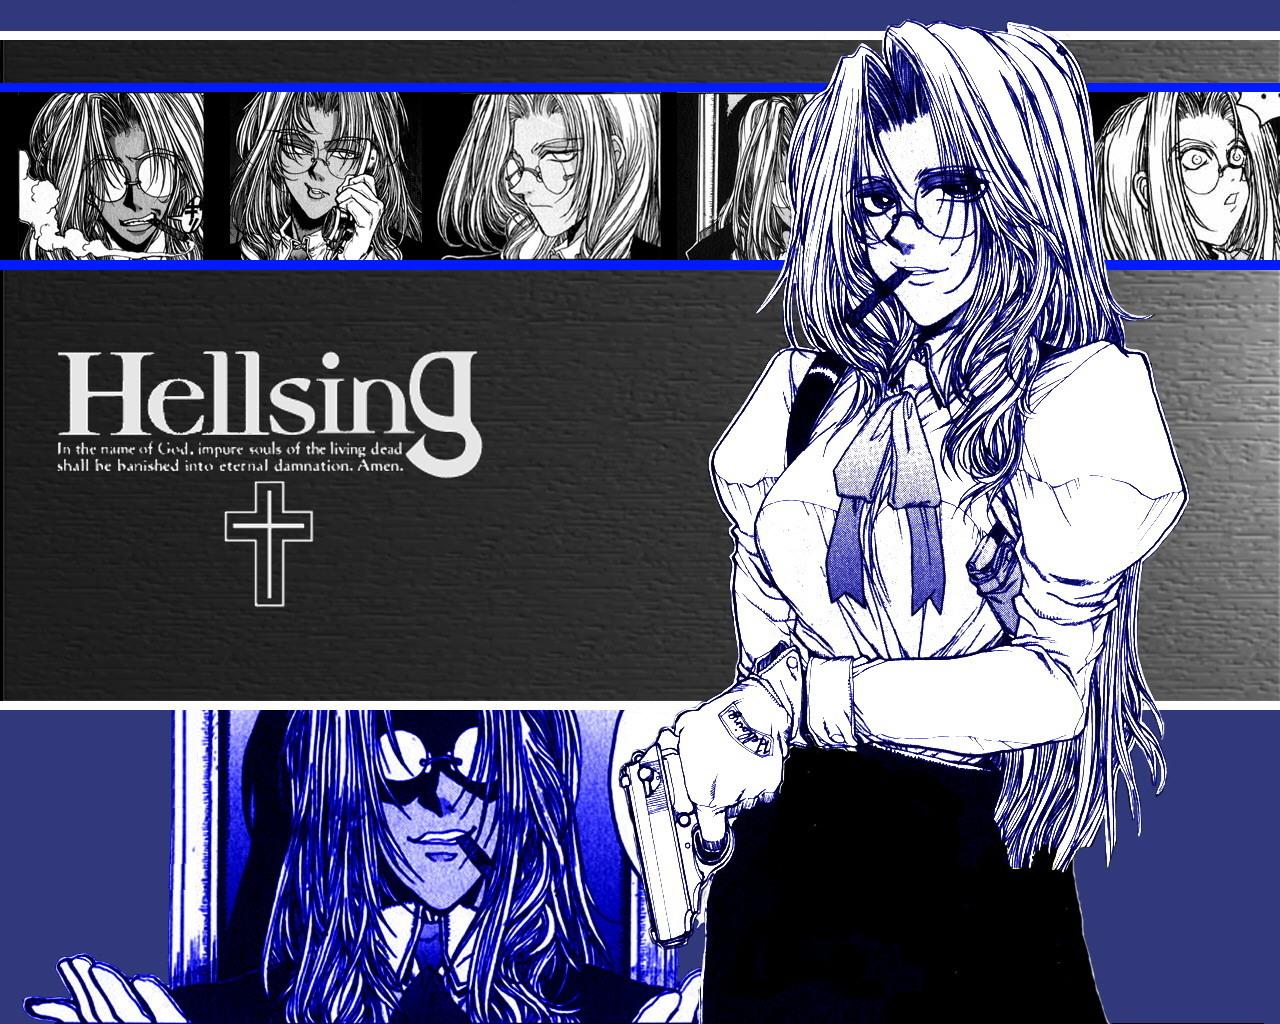 Hellsing Images Hellsing Integra Hd Fond Décran And Background